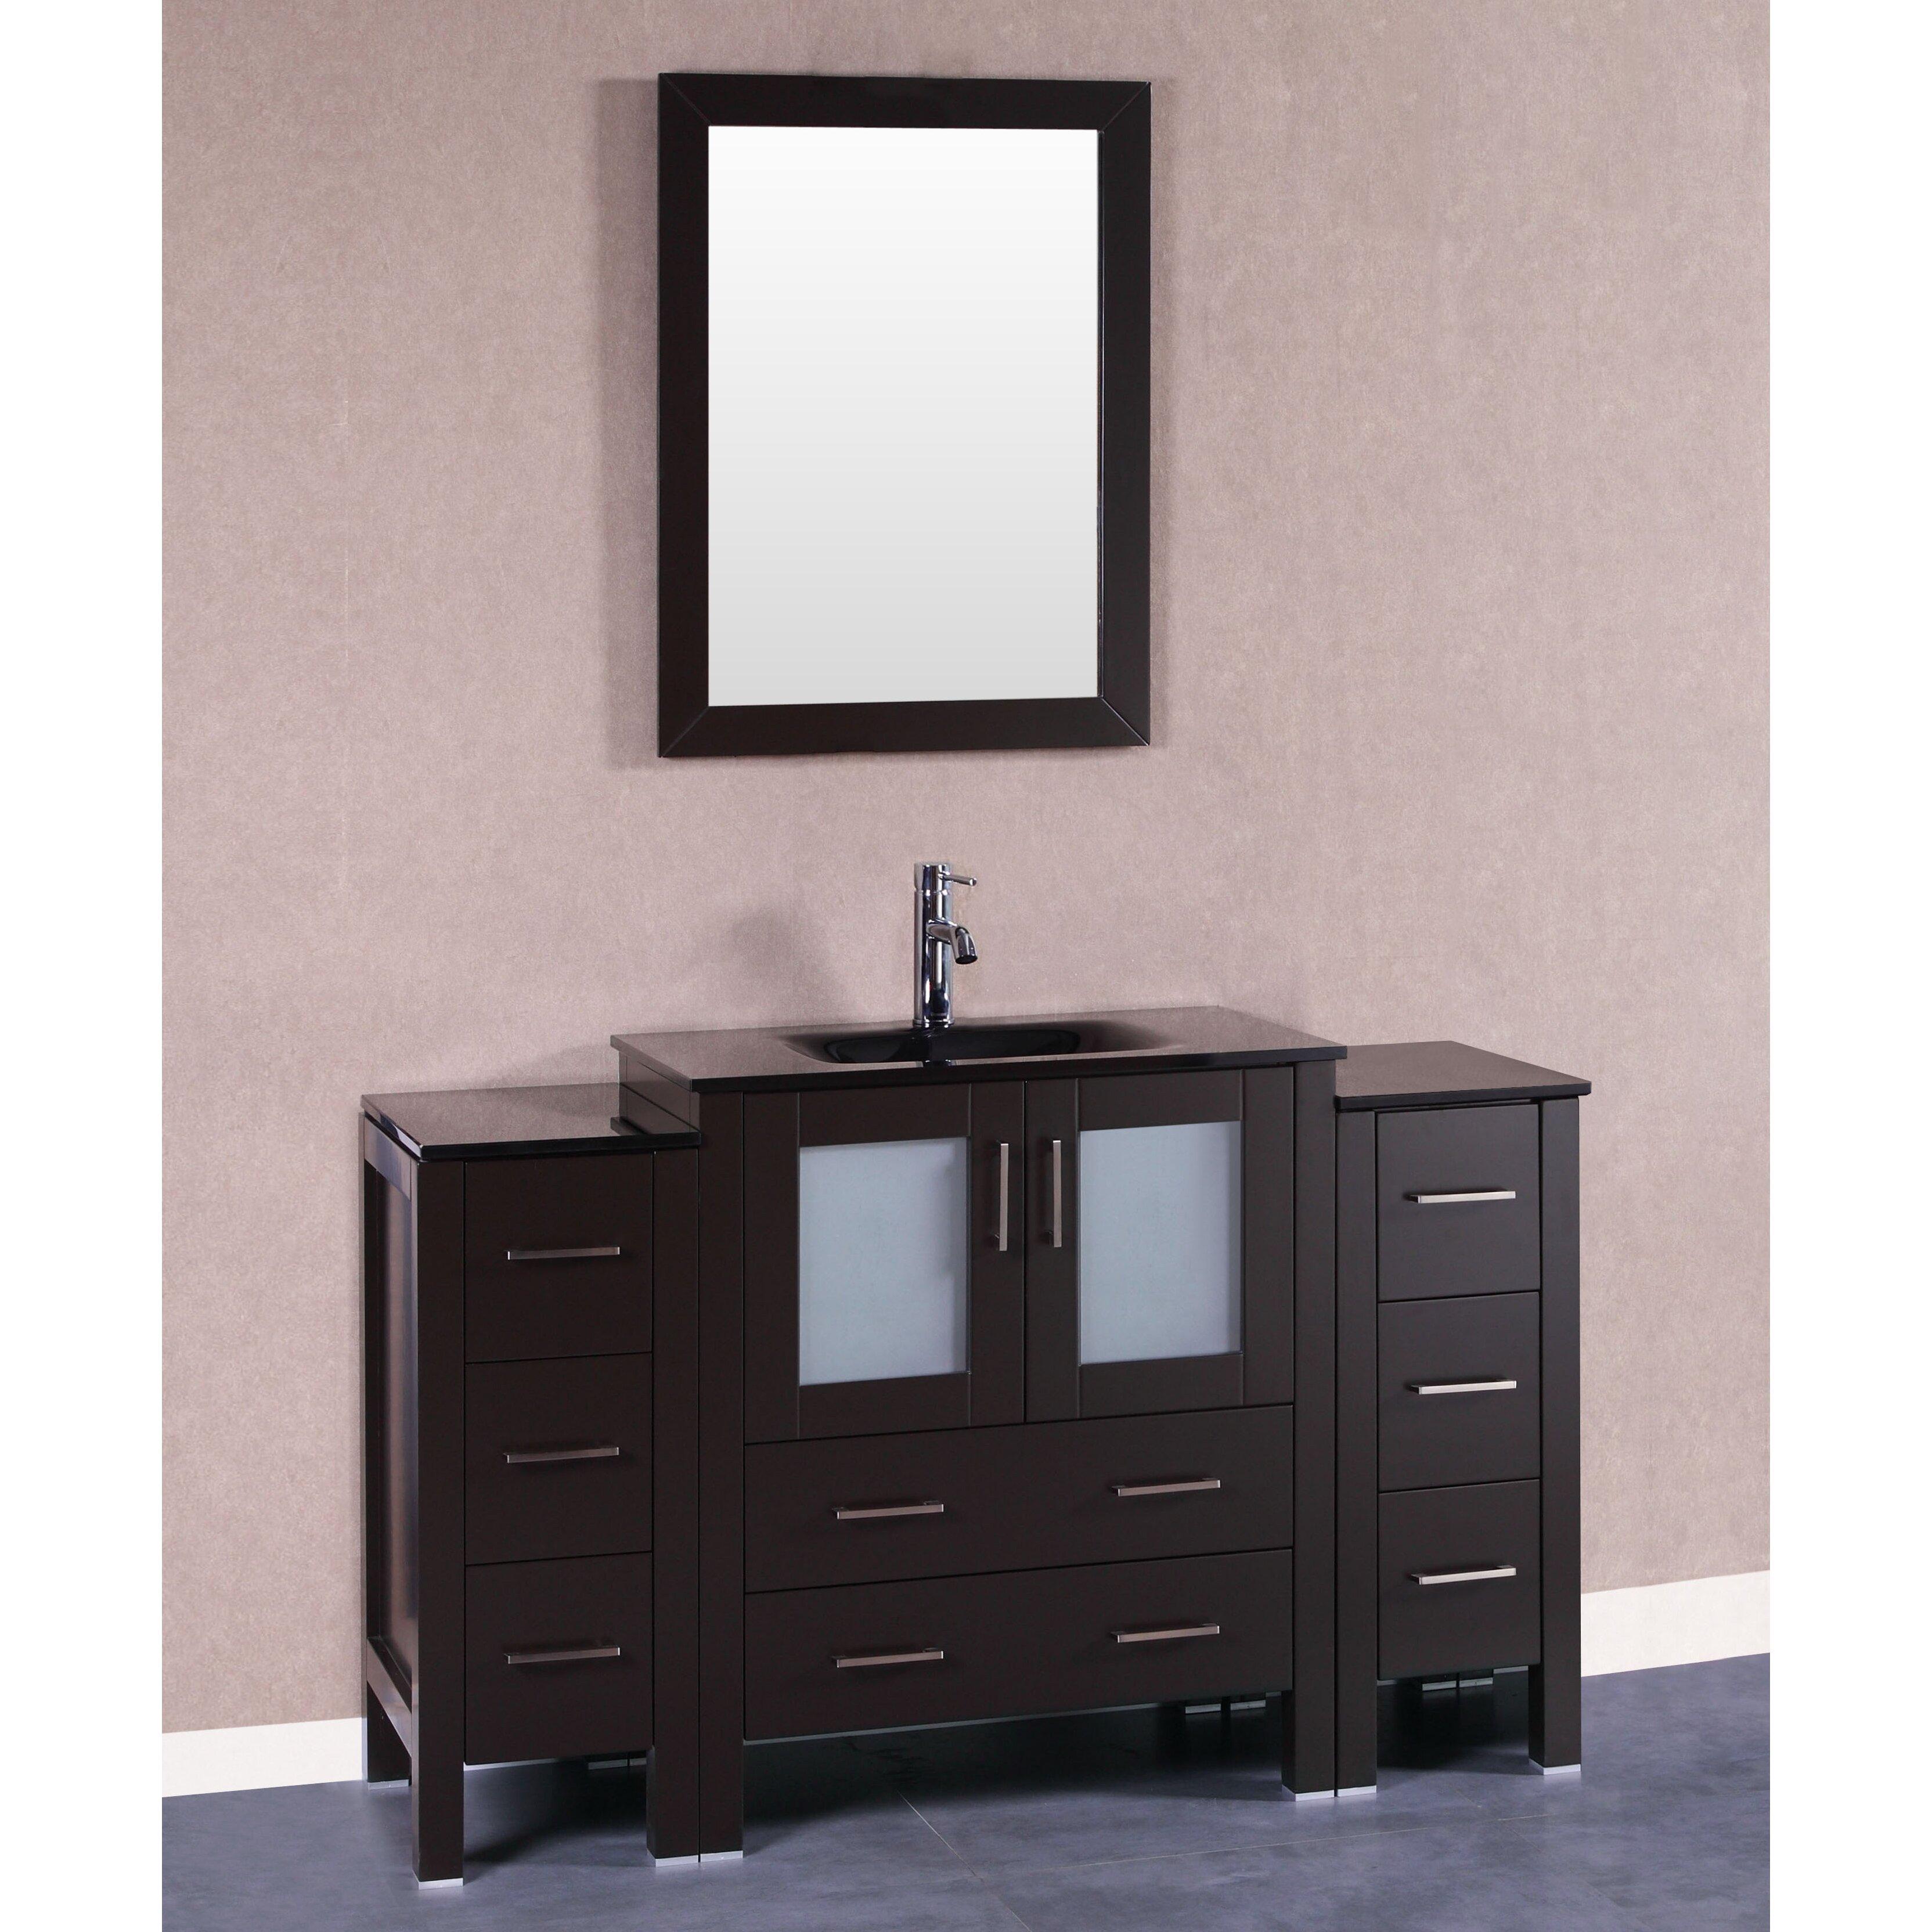 54 Inch Bathroom Vanity Cabinet Columbus Ideas Deebonk